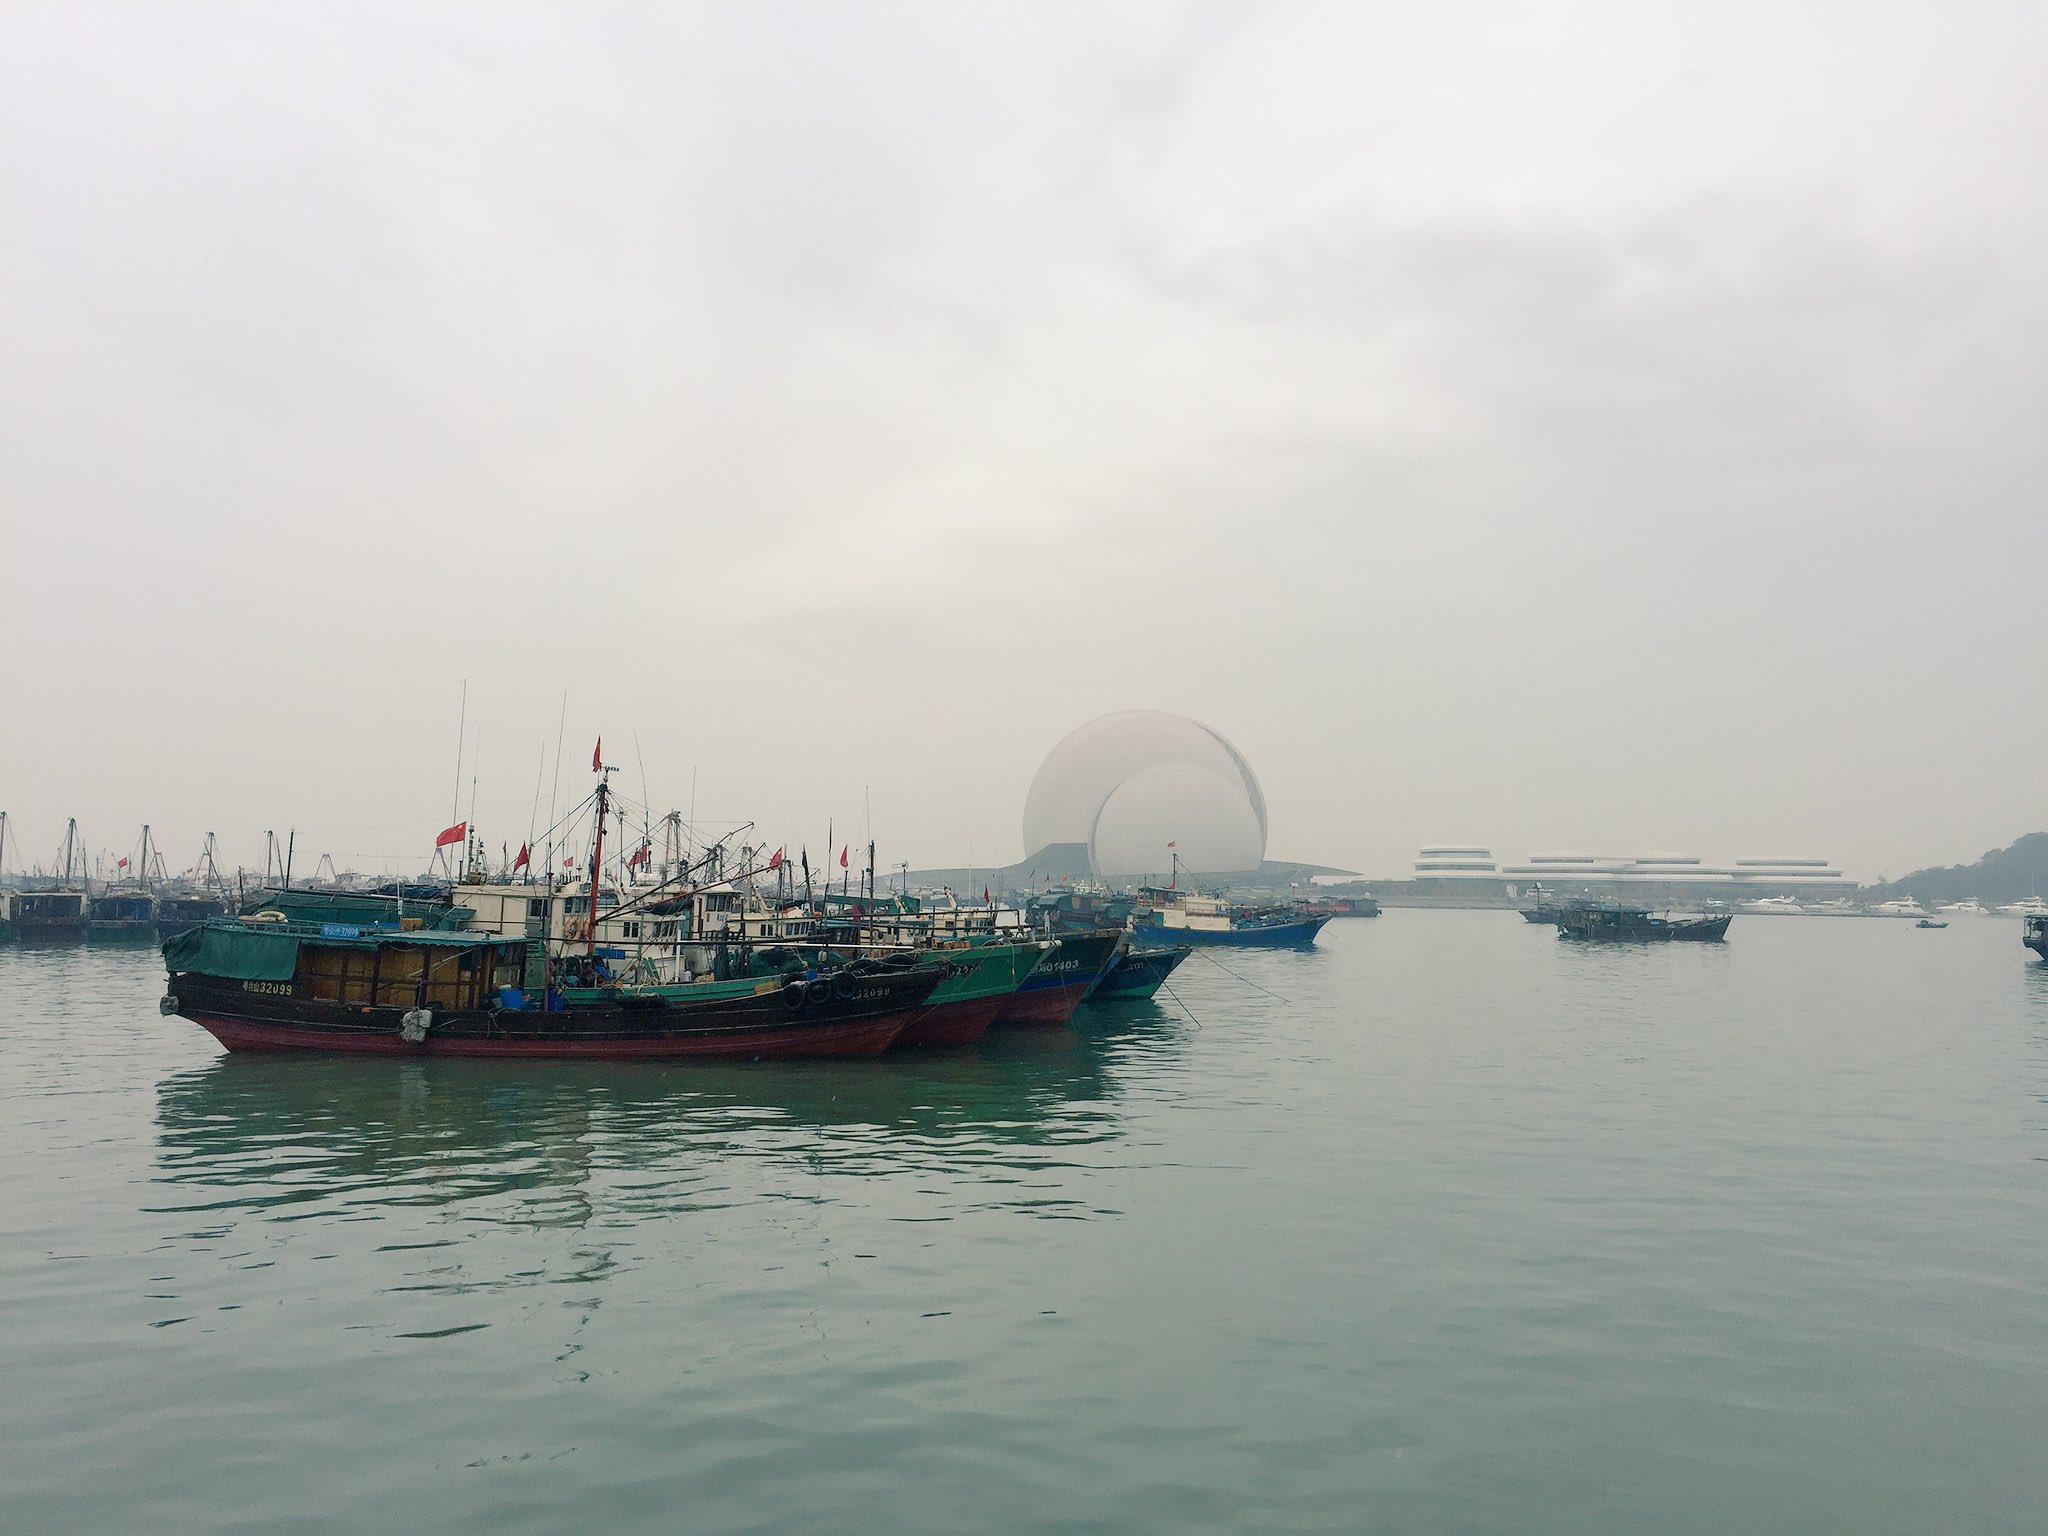 Fishing boats, luxury yachts and the Zhuhai Opera House. https://t.co/QdPAbUrgRX